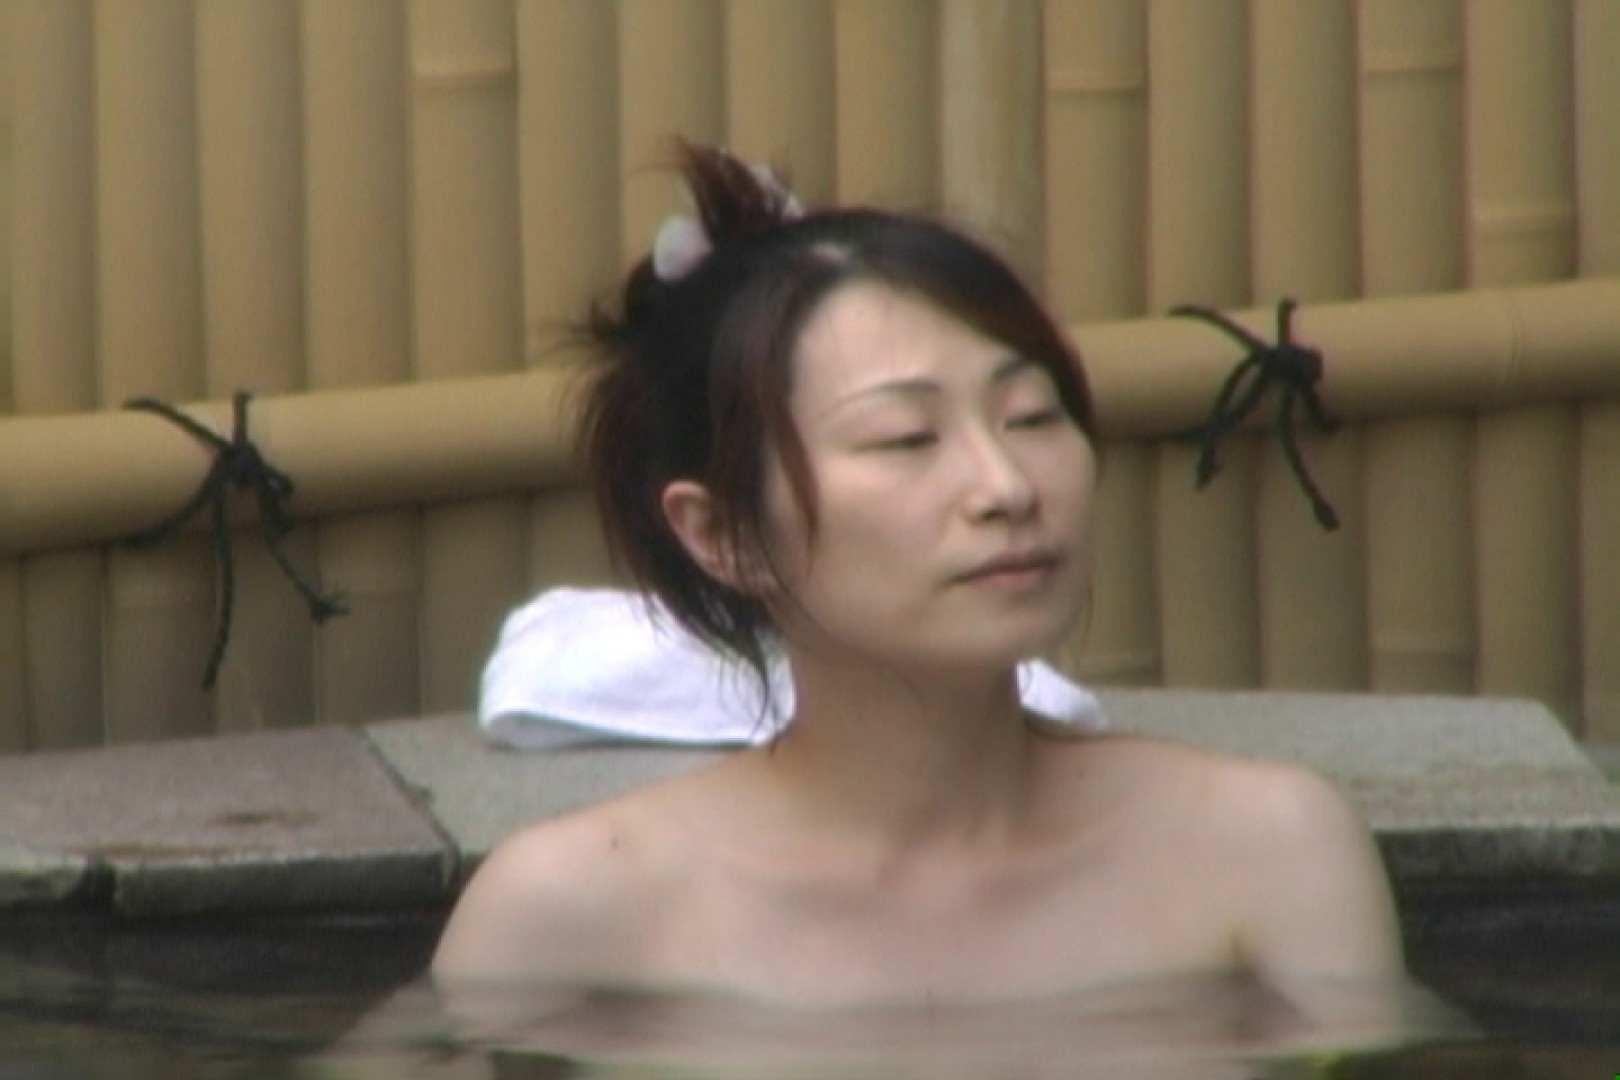 Aquaな露天風呂Vol.615 0   0  36連発 5